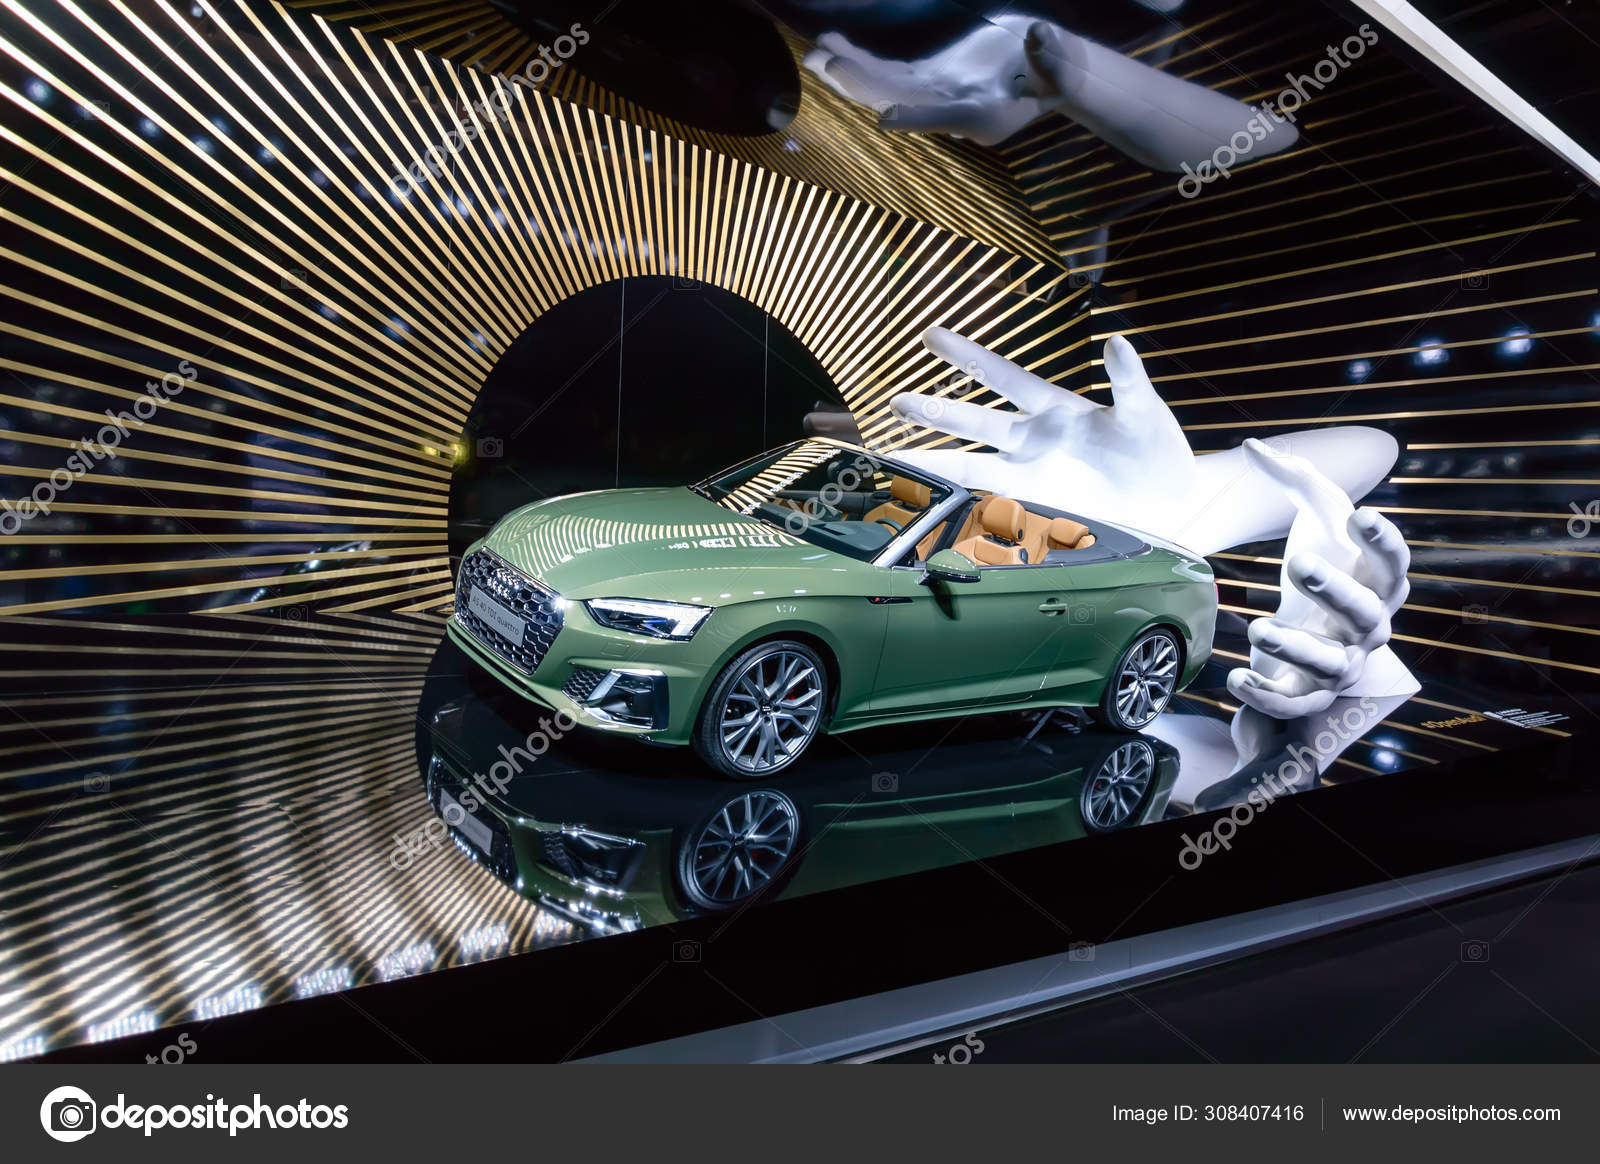 Novo Carro Verde Audi A5 40 Tdi Quattro Cabriolet Apresentado No Iaa 2019 Fotografia De Stock Editorial C Julia Lav 308407416